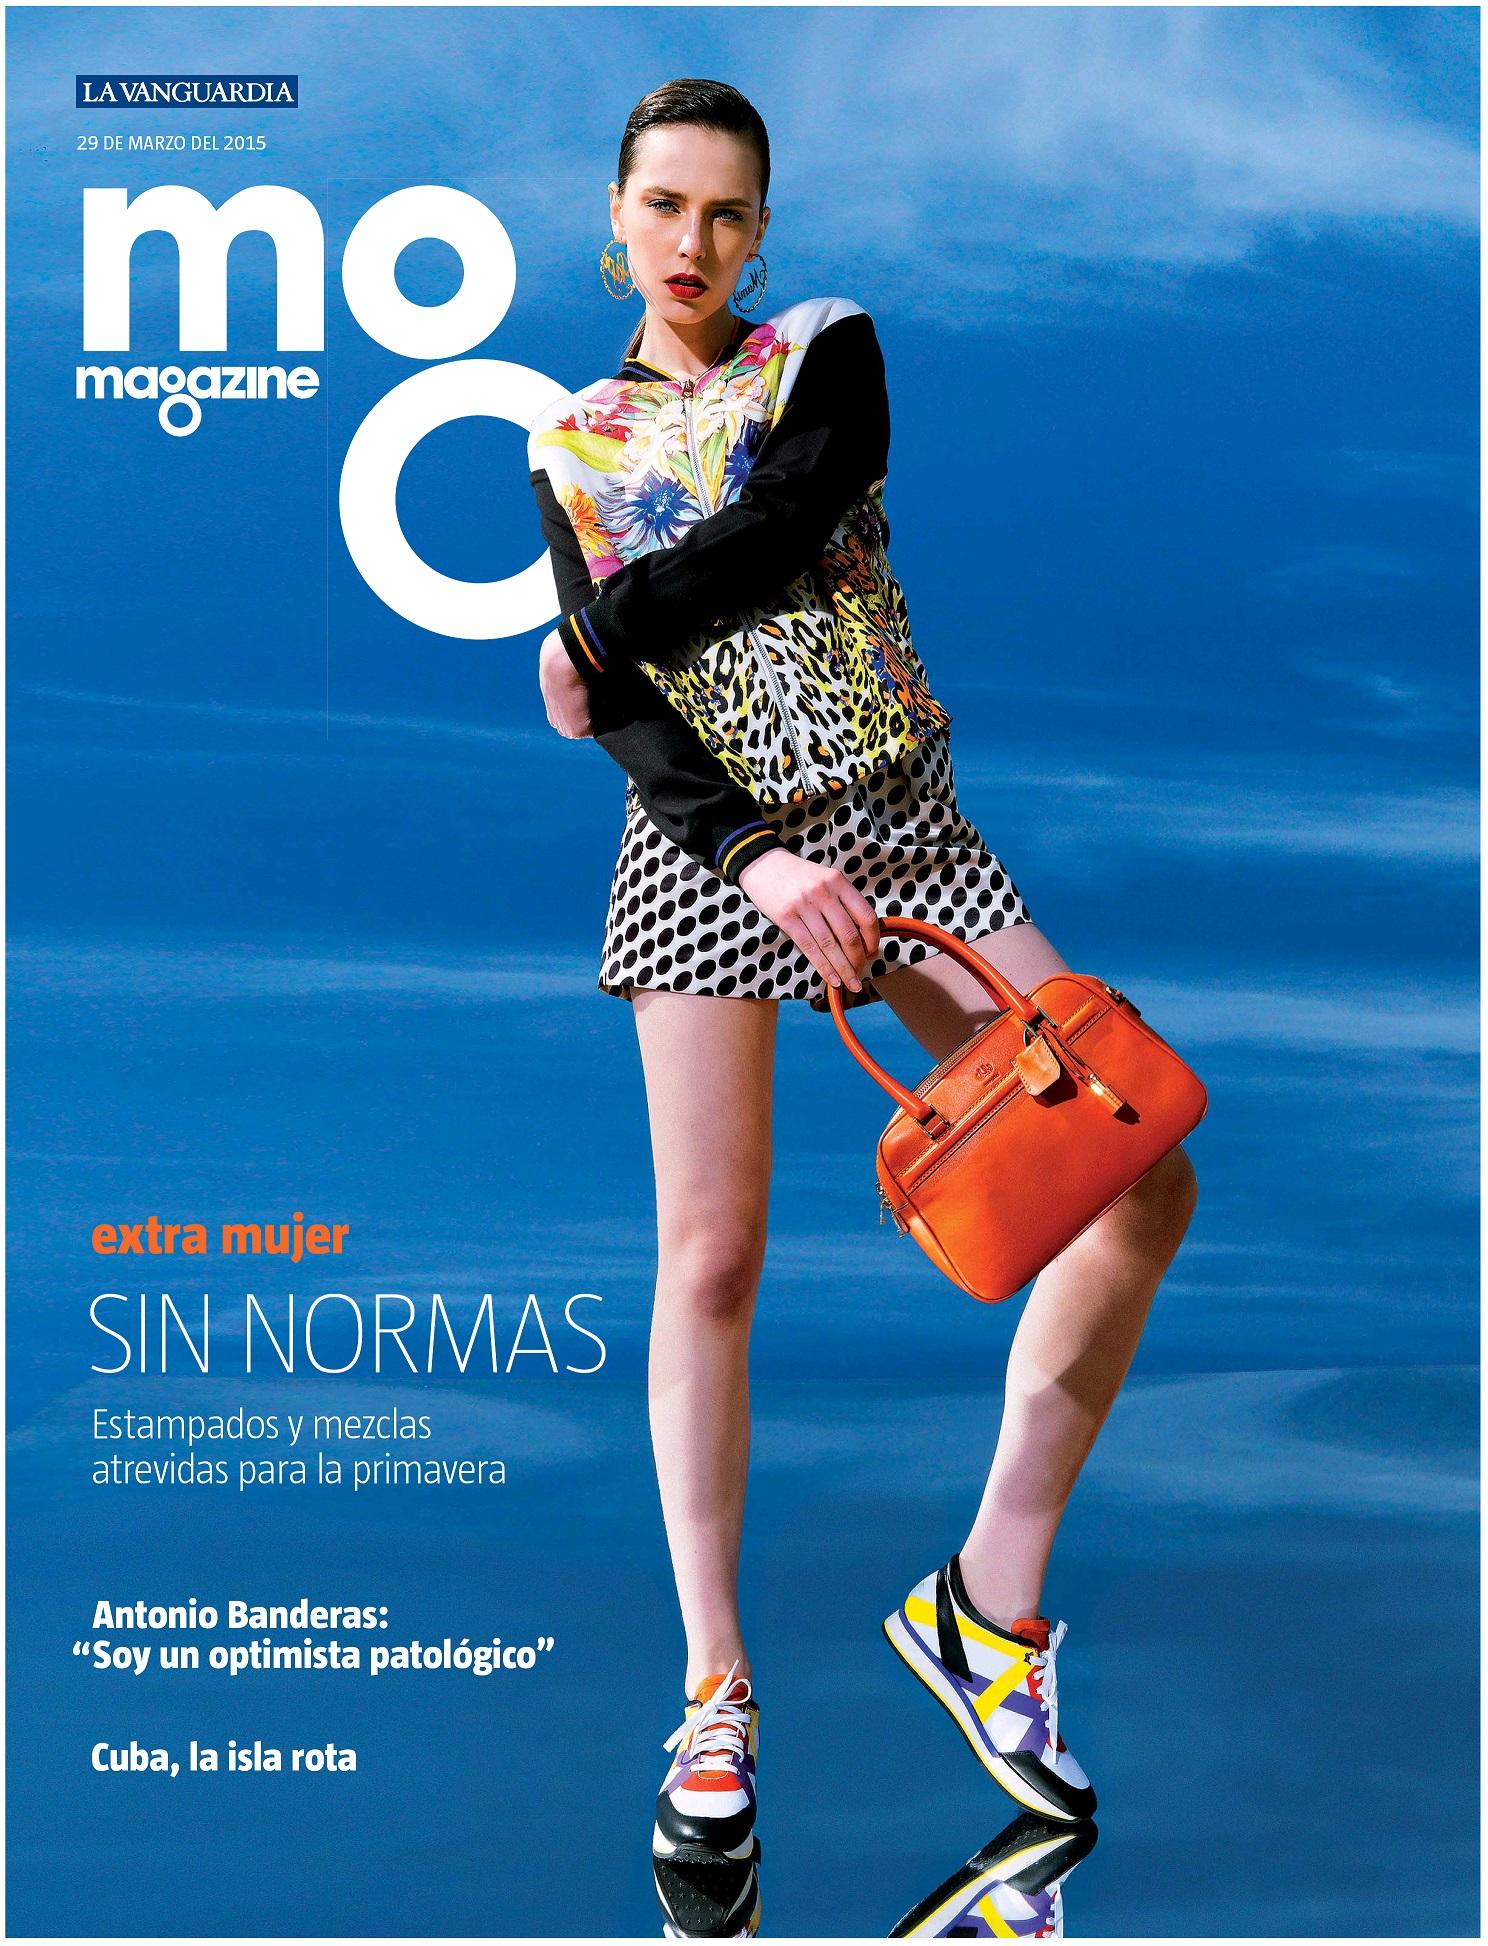 MEGAZINE portada 25 de Marzo 2015